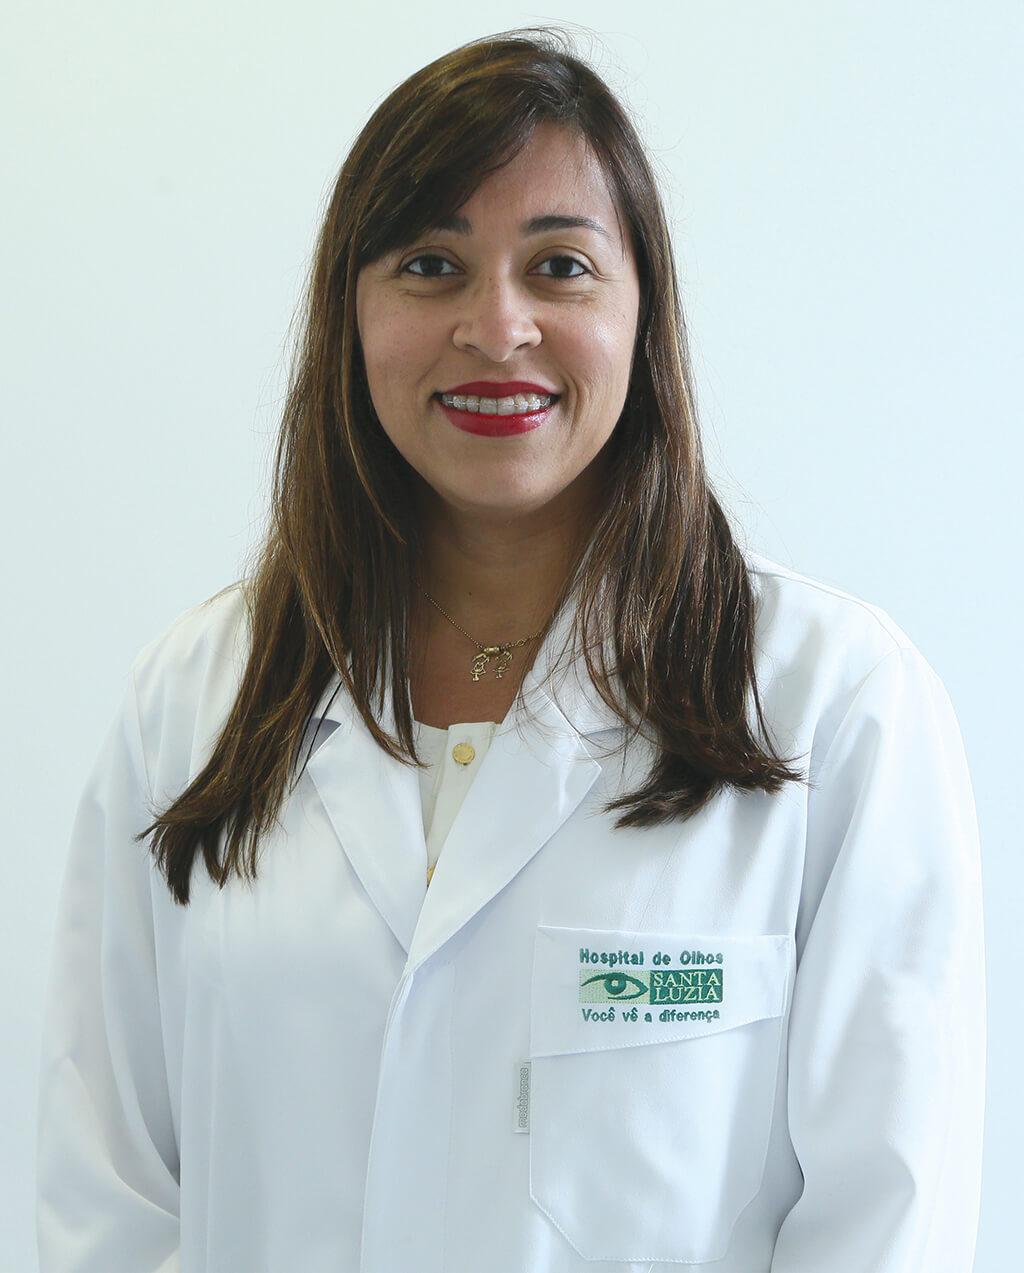 Mirelle Souza Leão